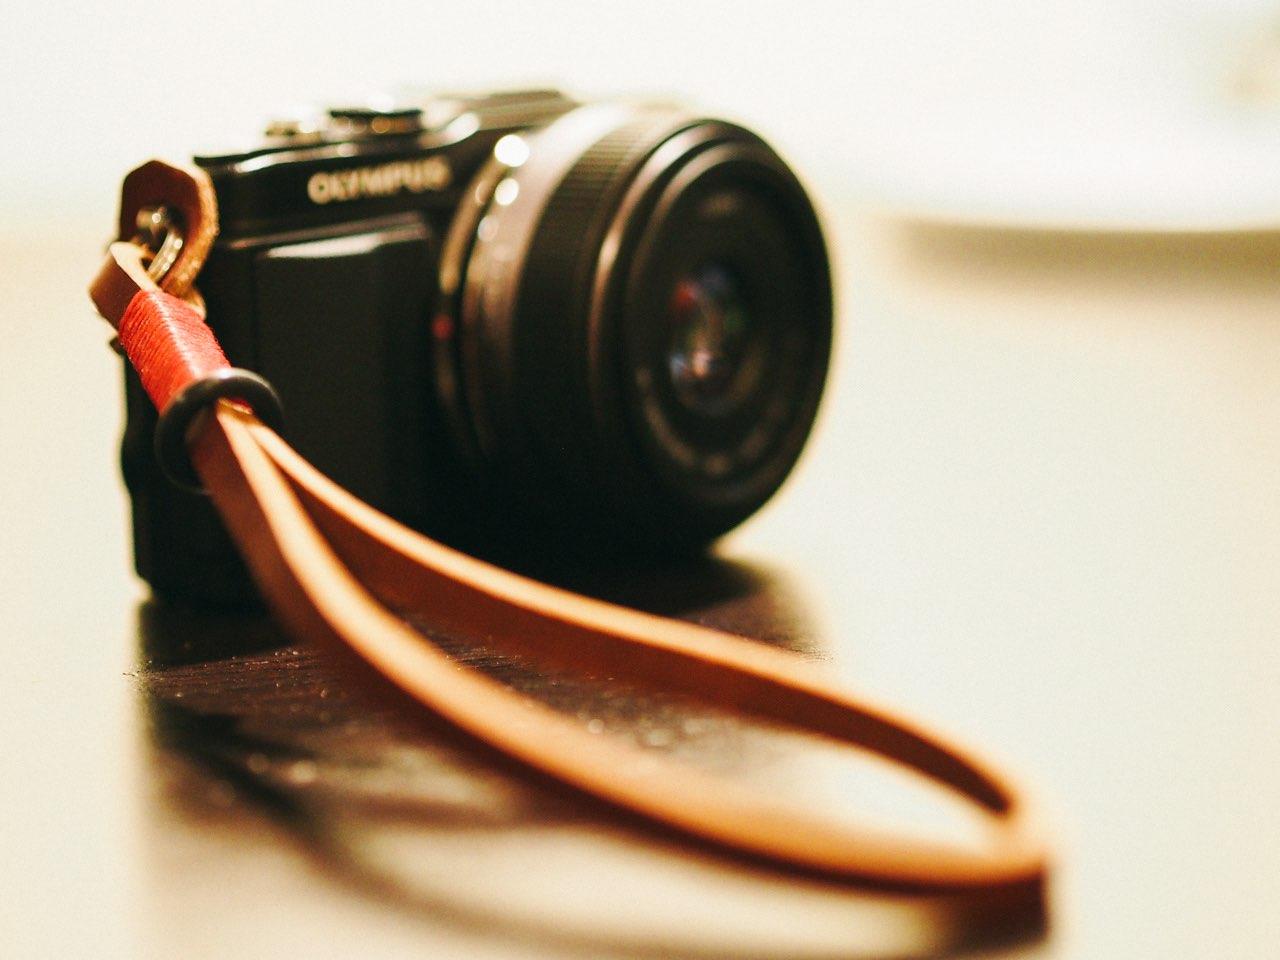 Gordy's Camera Strap ($18 – $48)